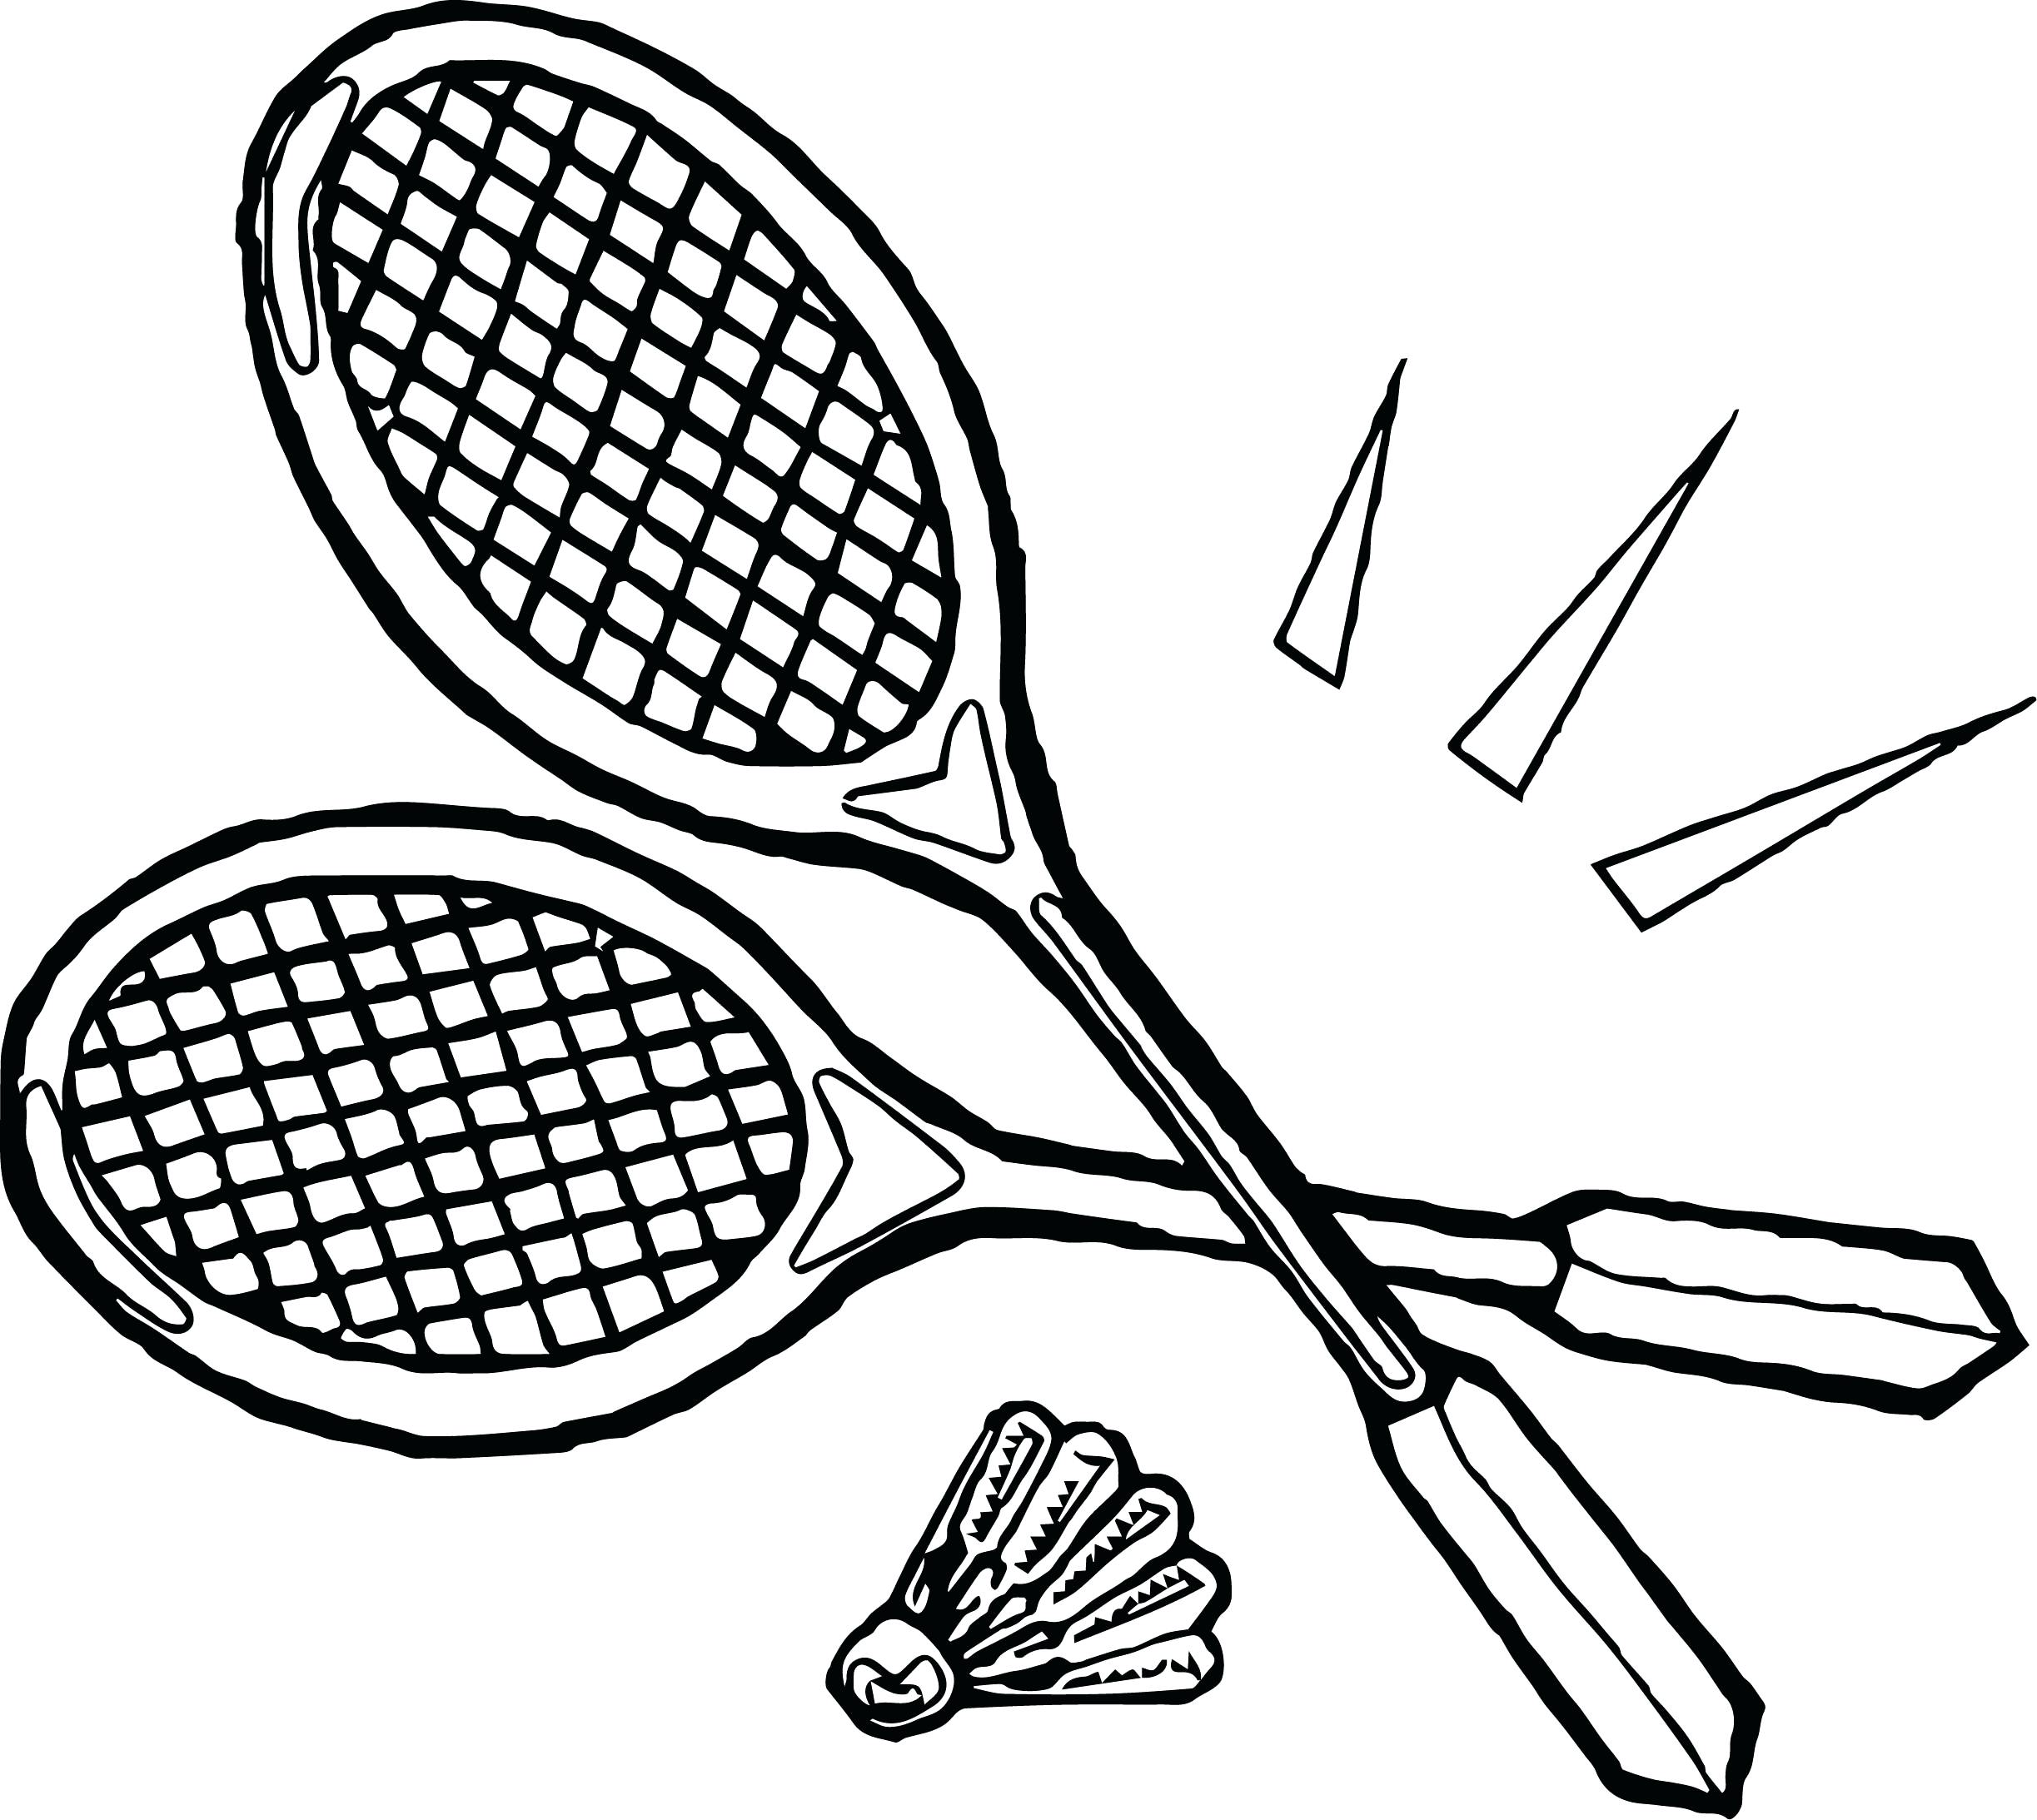 Tennis Drawing At Getdrawings